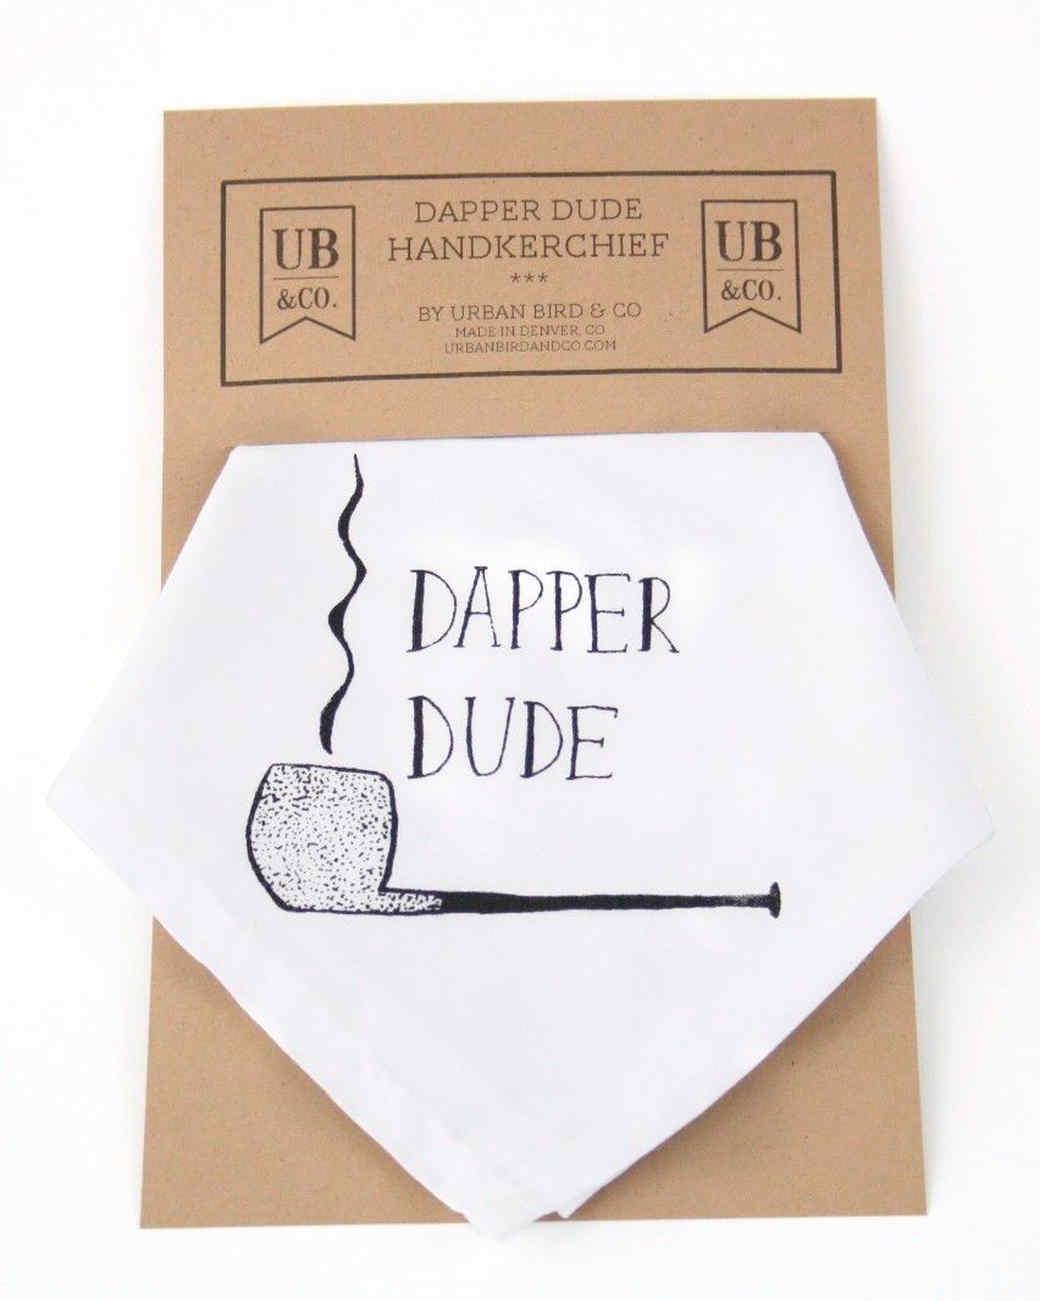 urban-bird-and-co-dapper-dude-mens-handkerchief-0915.jpg